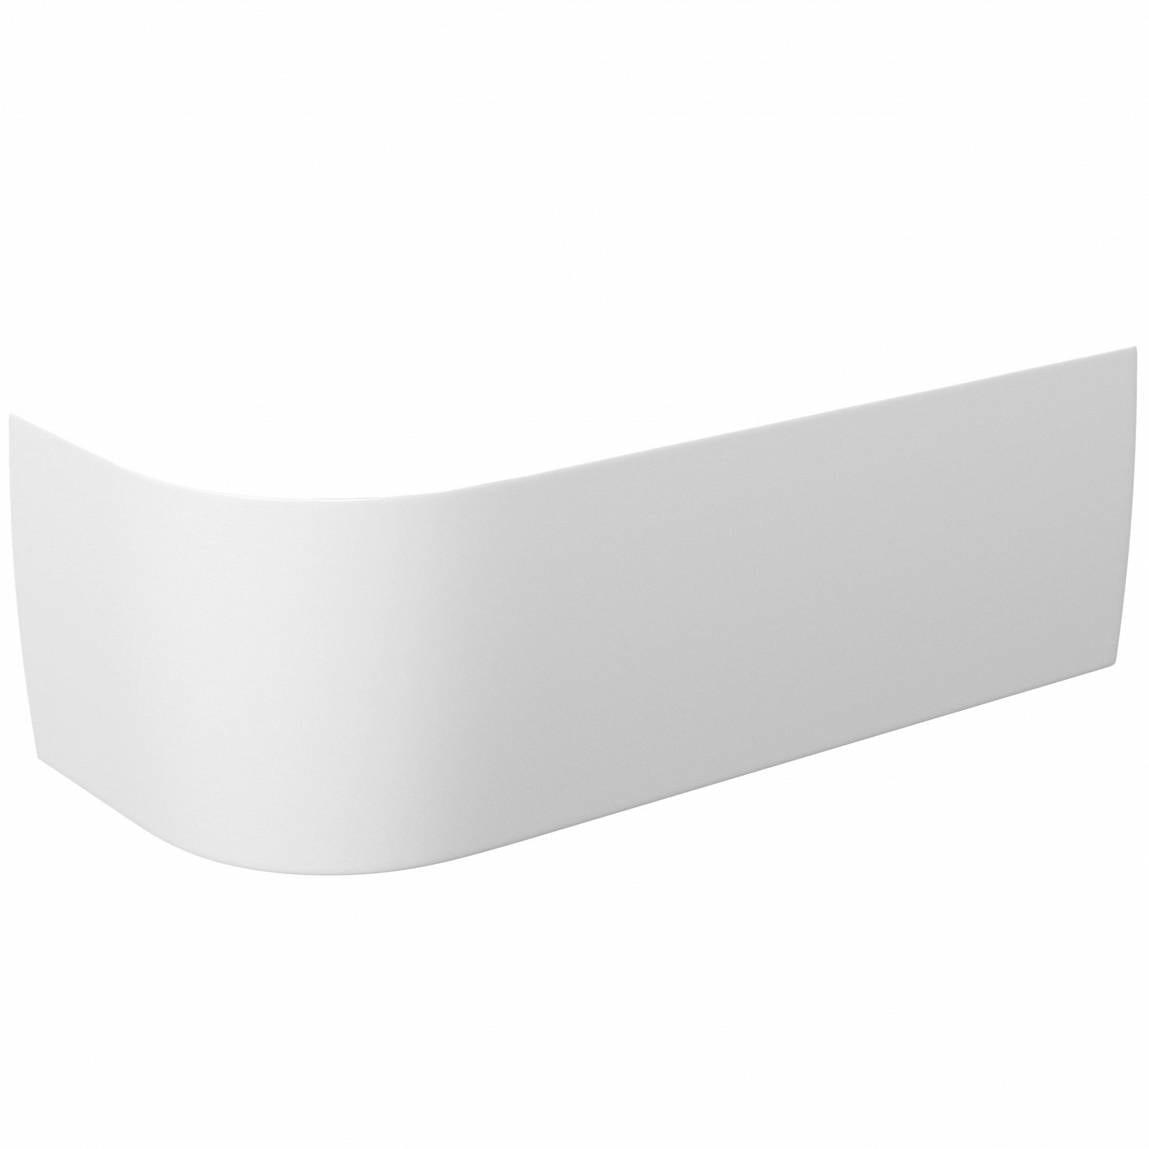 Elsdon D-Shaped Back to Wall Corner Bath Panel RH